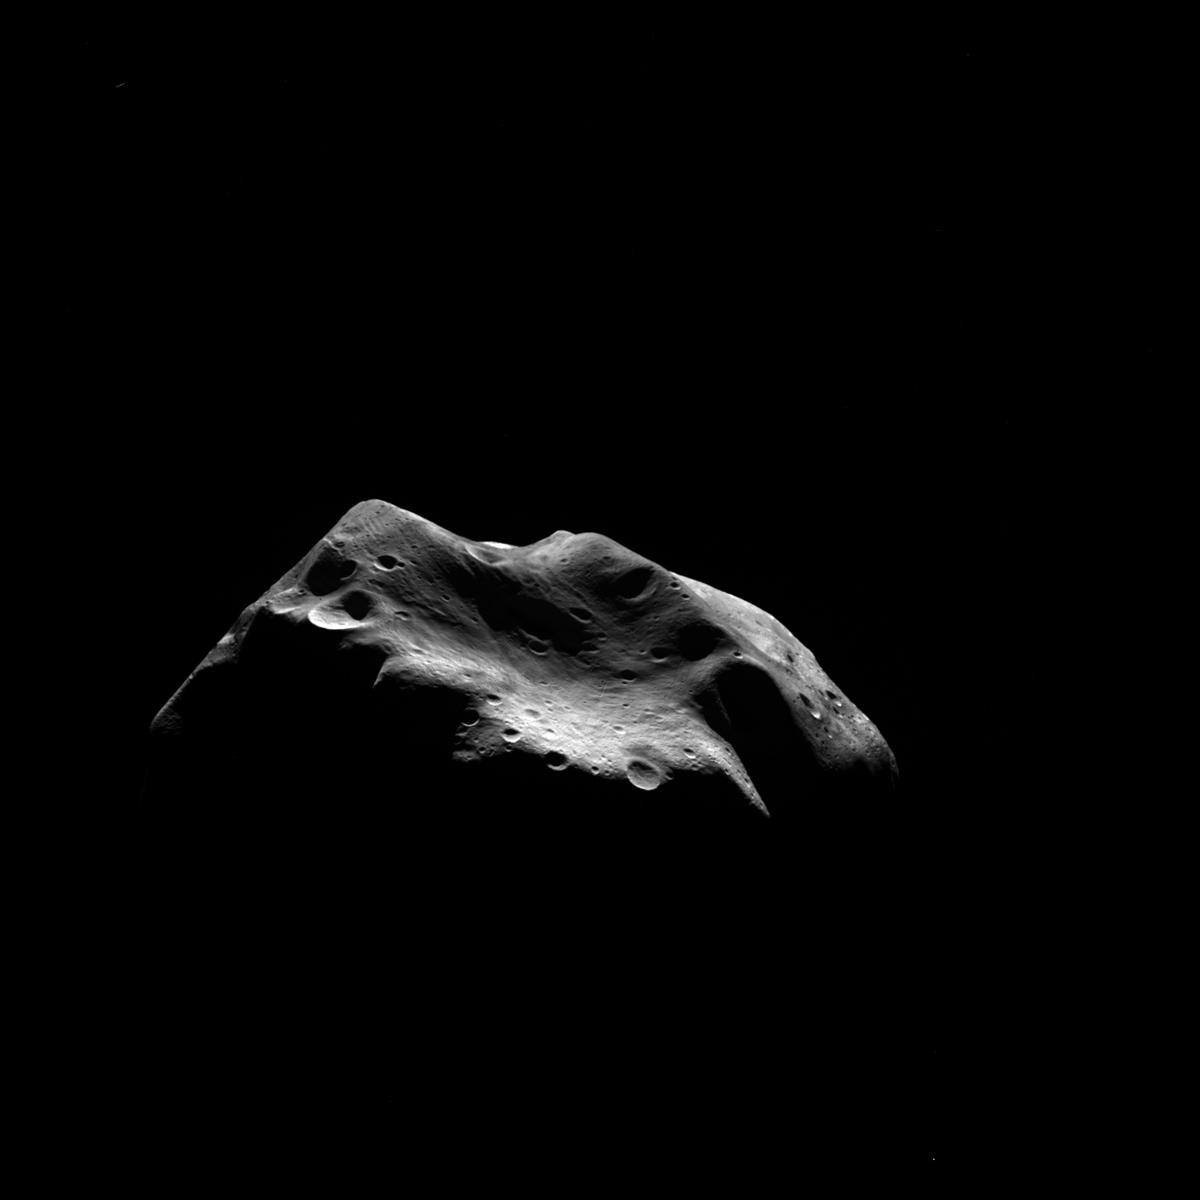 Asteroid Lutetia Seen by OSIRIS July 2010 1